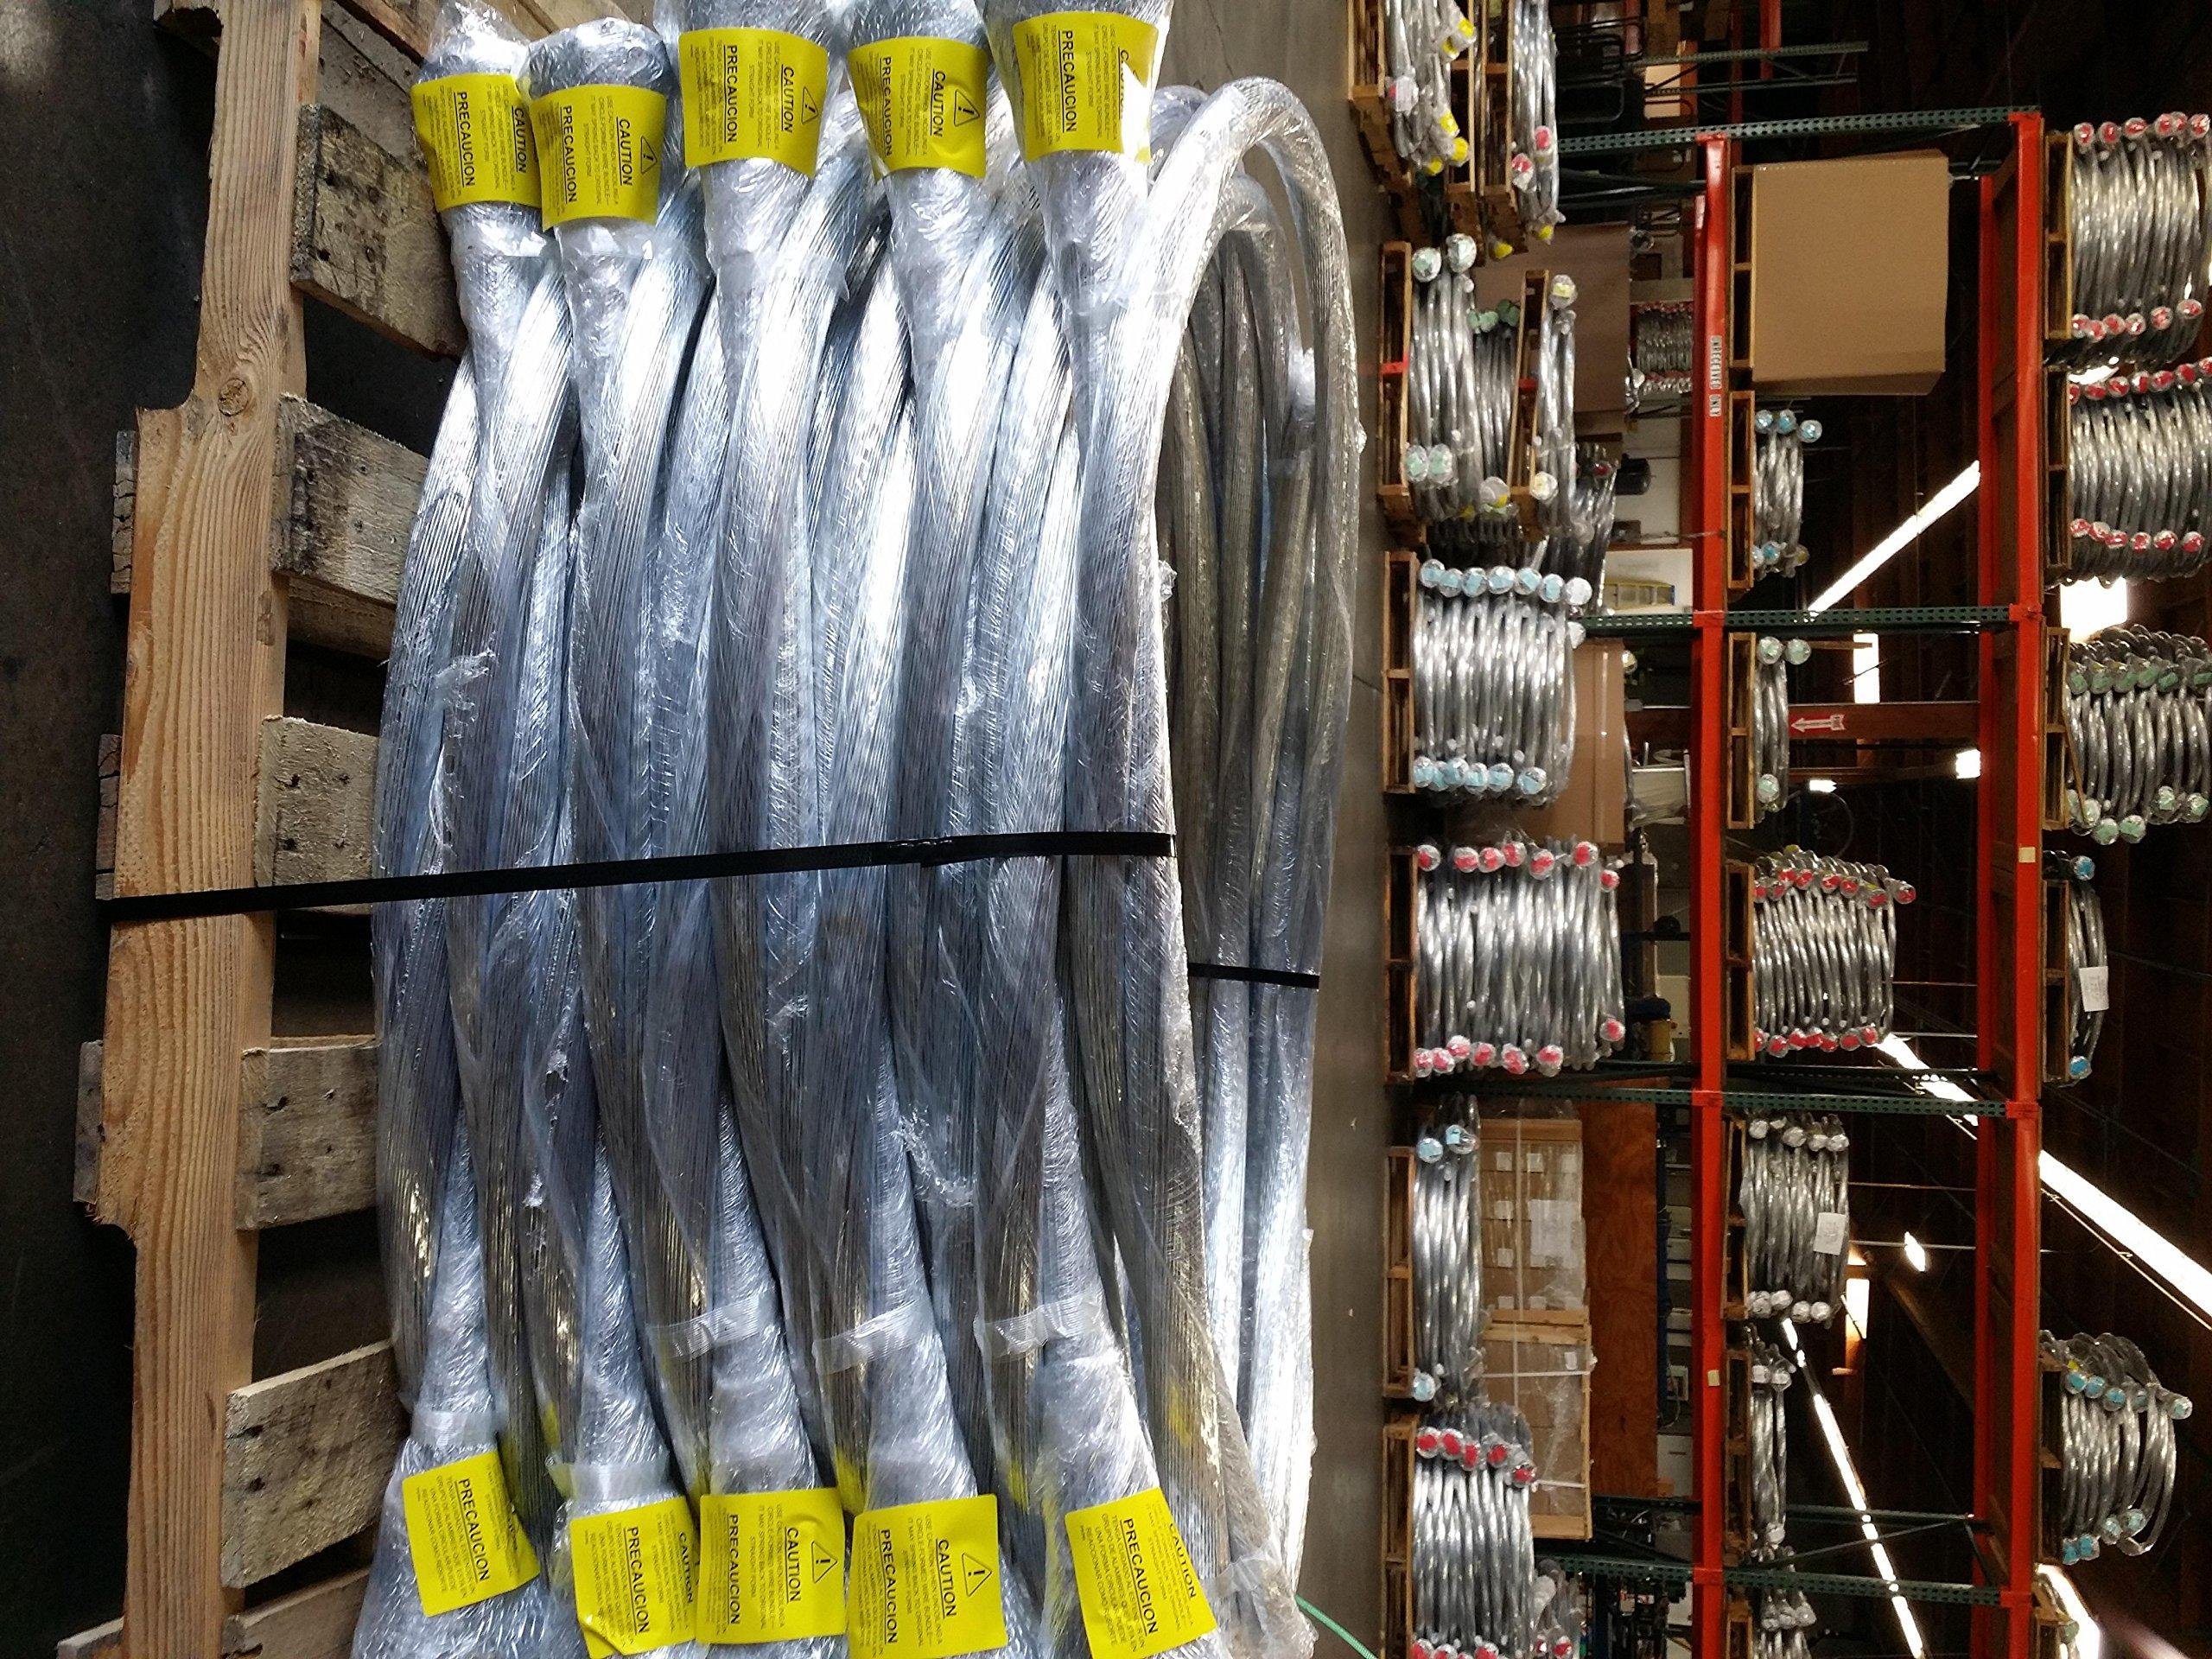 3 bundles - 14 gauge x 14 ft galvanized bale tie wire (250 strands/bundle) by Wire & Packaging